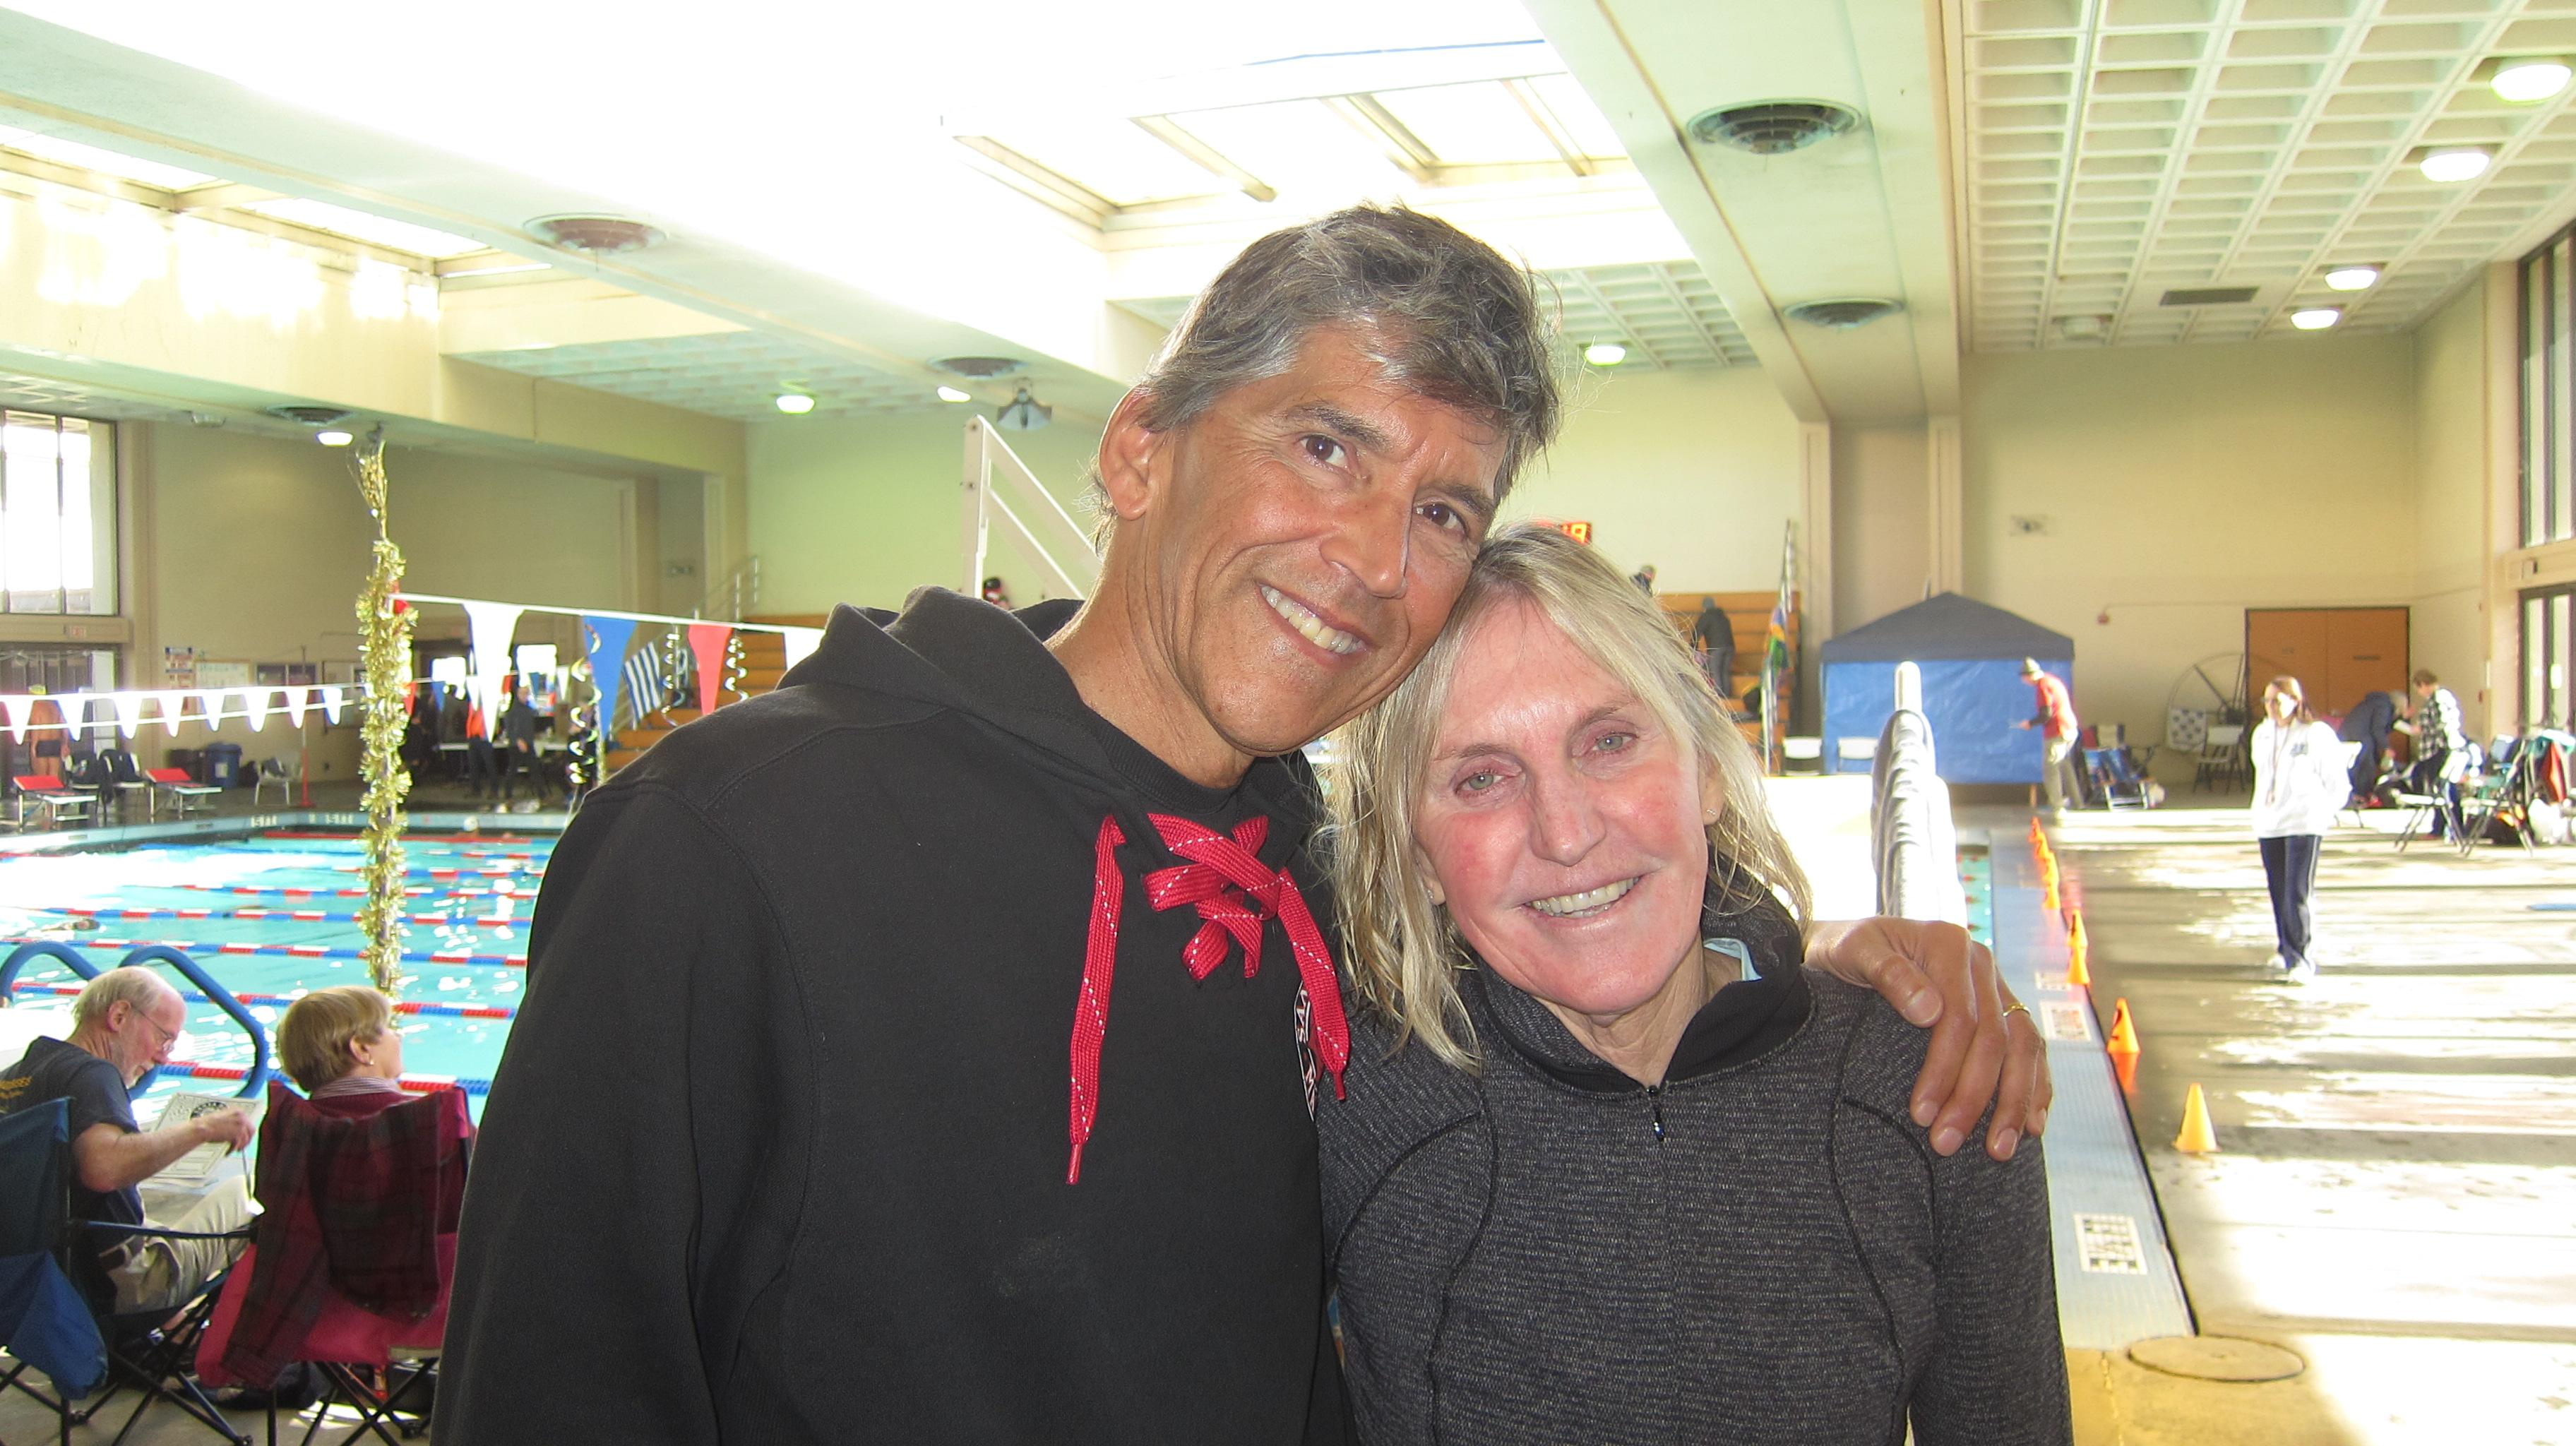 John Morales & Laura Val